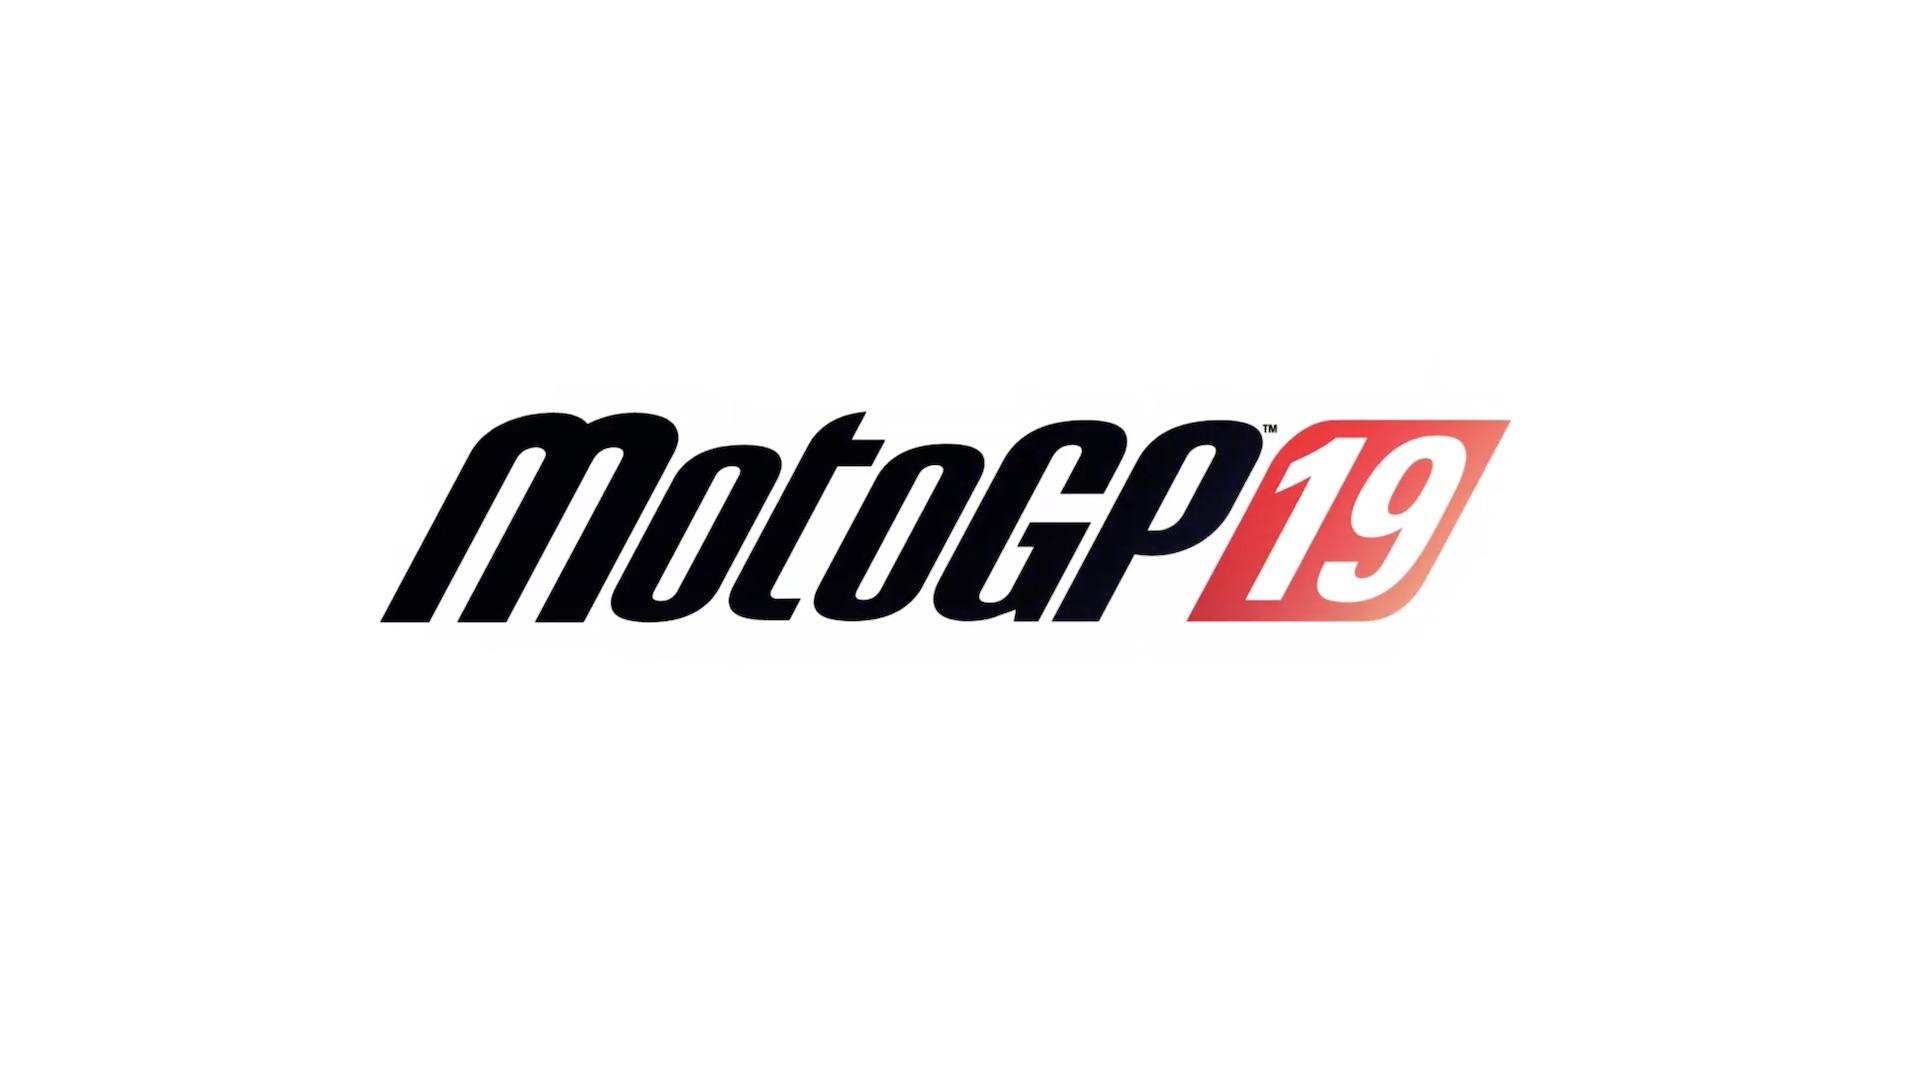 Le studio Milestone annonce aujourd'hui motoGP 19